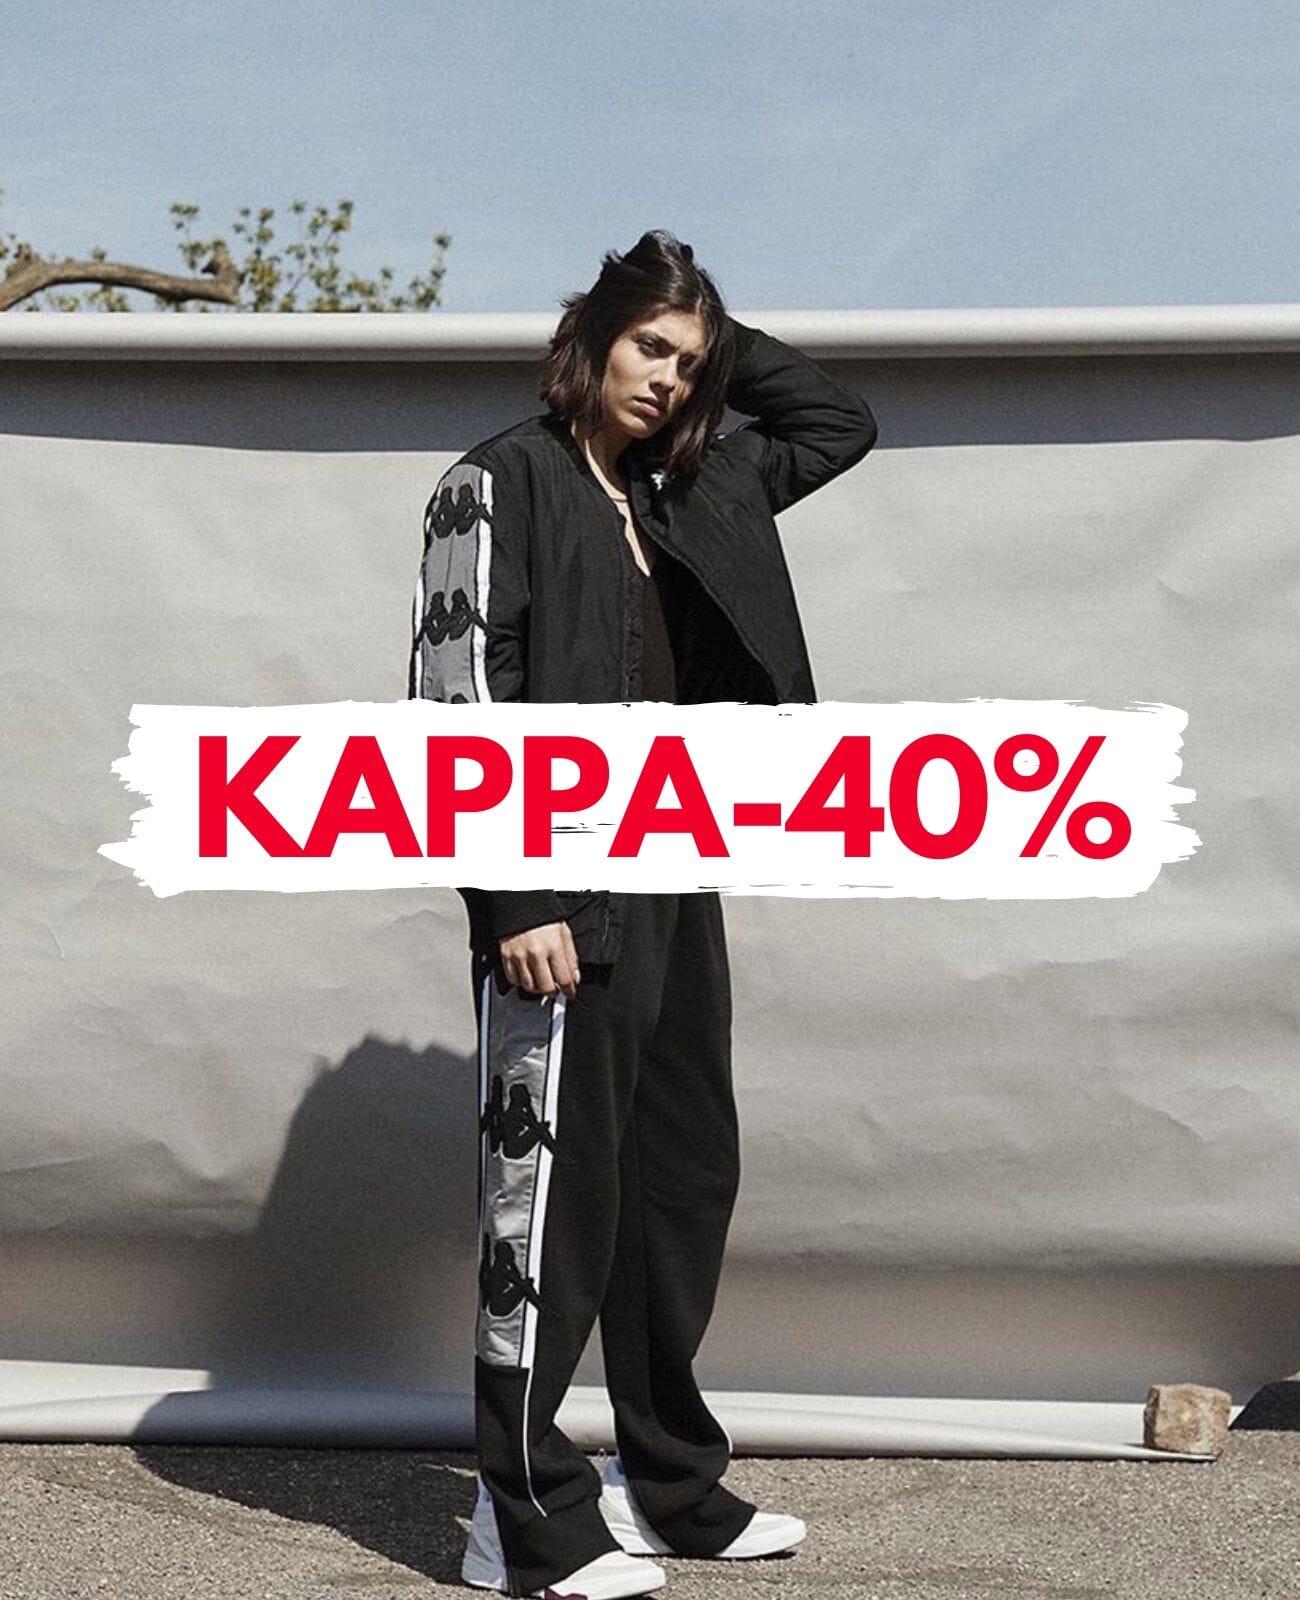 Kappa Streetwear | Saldi invernali | Spedizione gratis